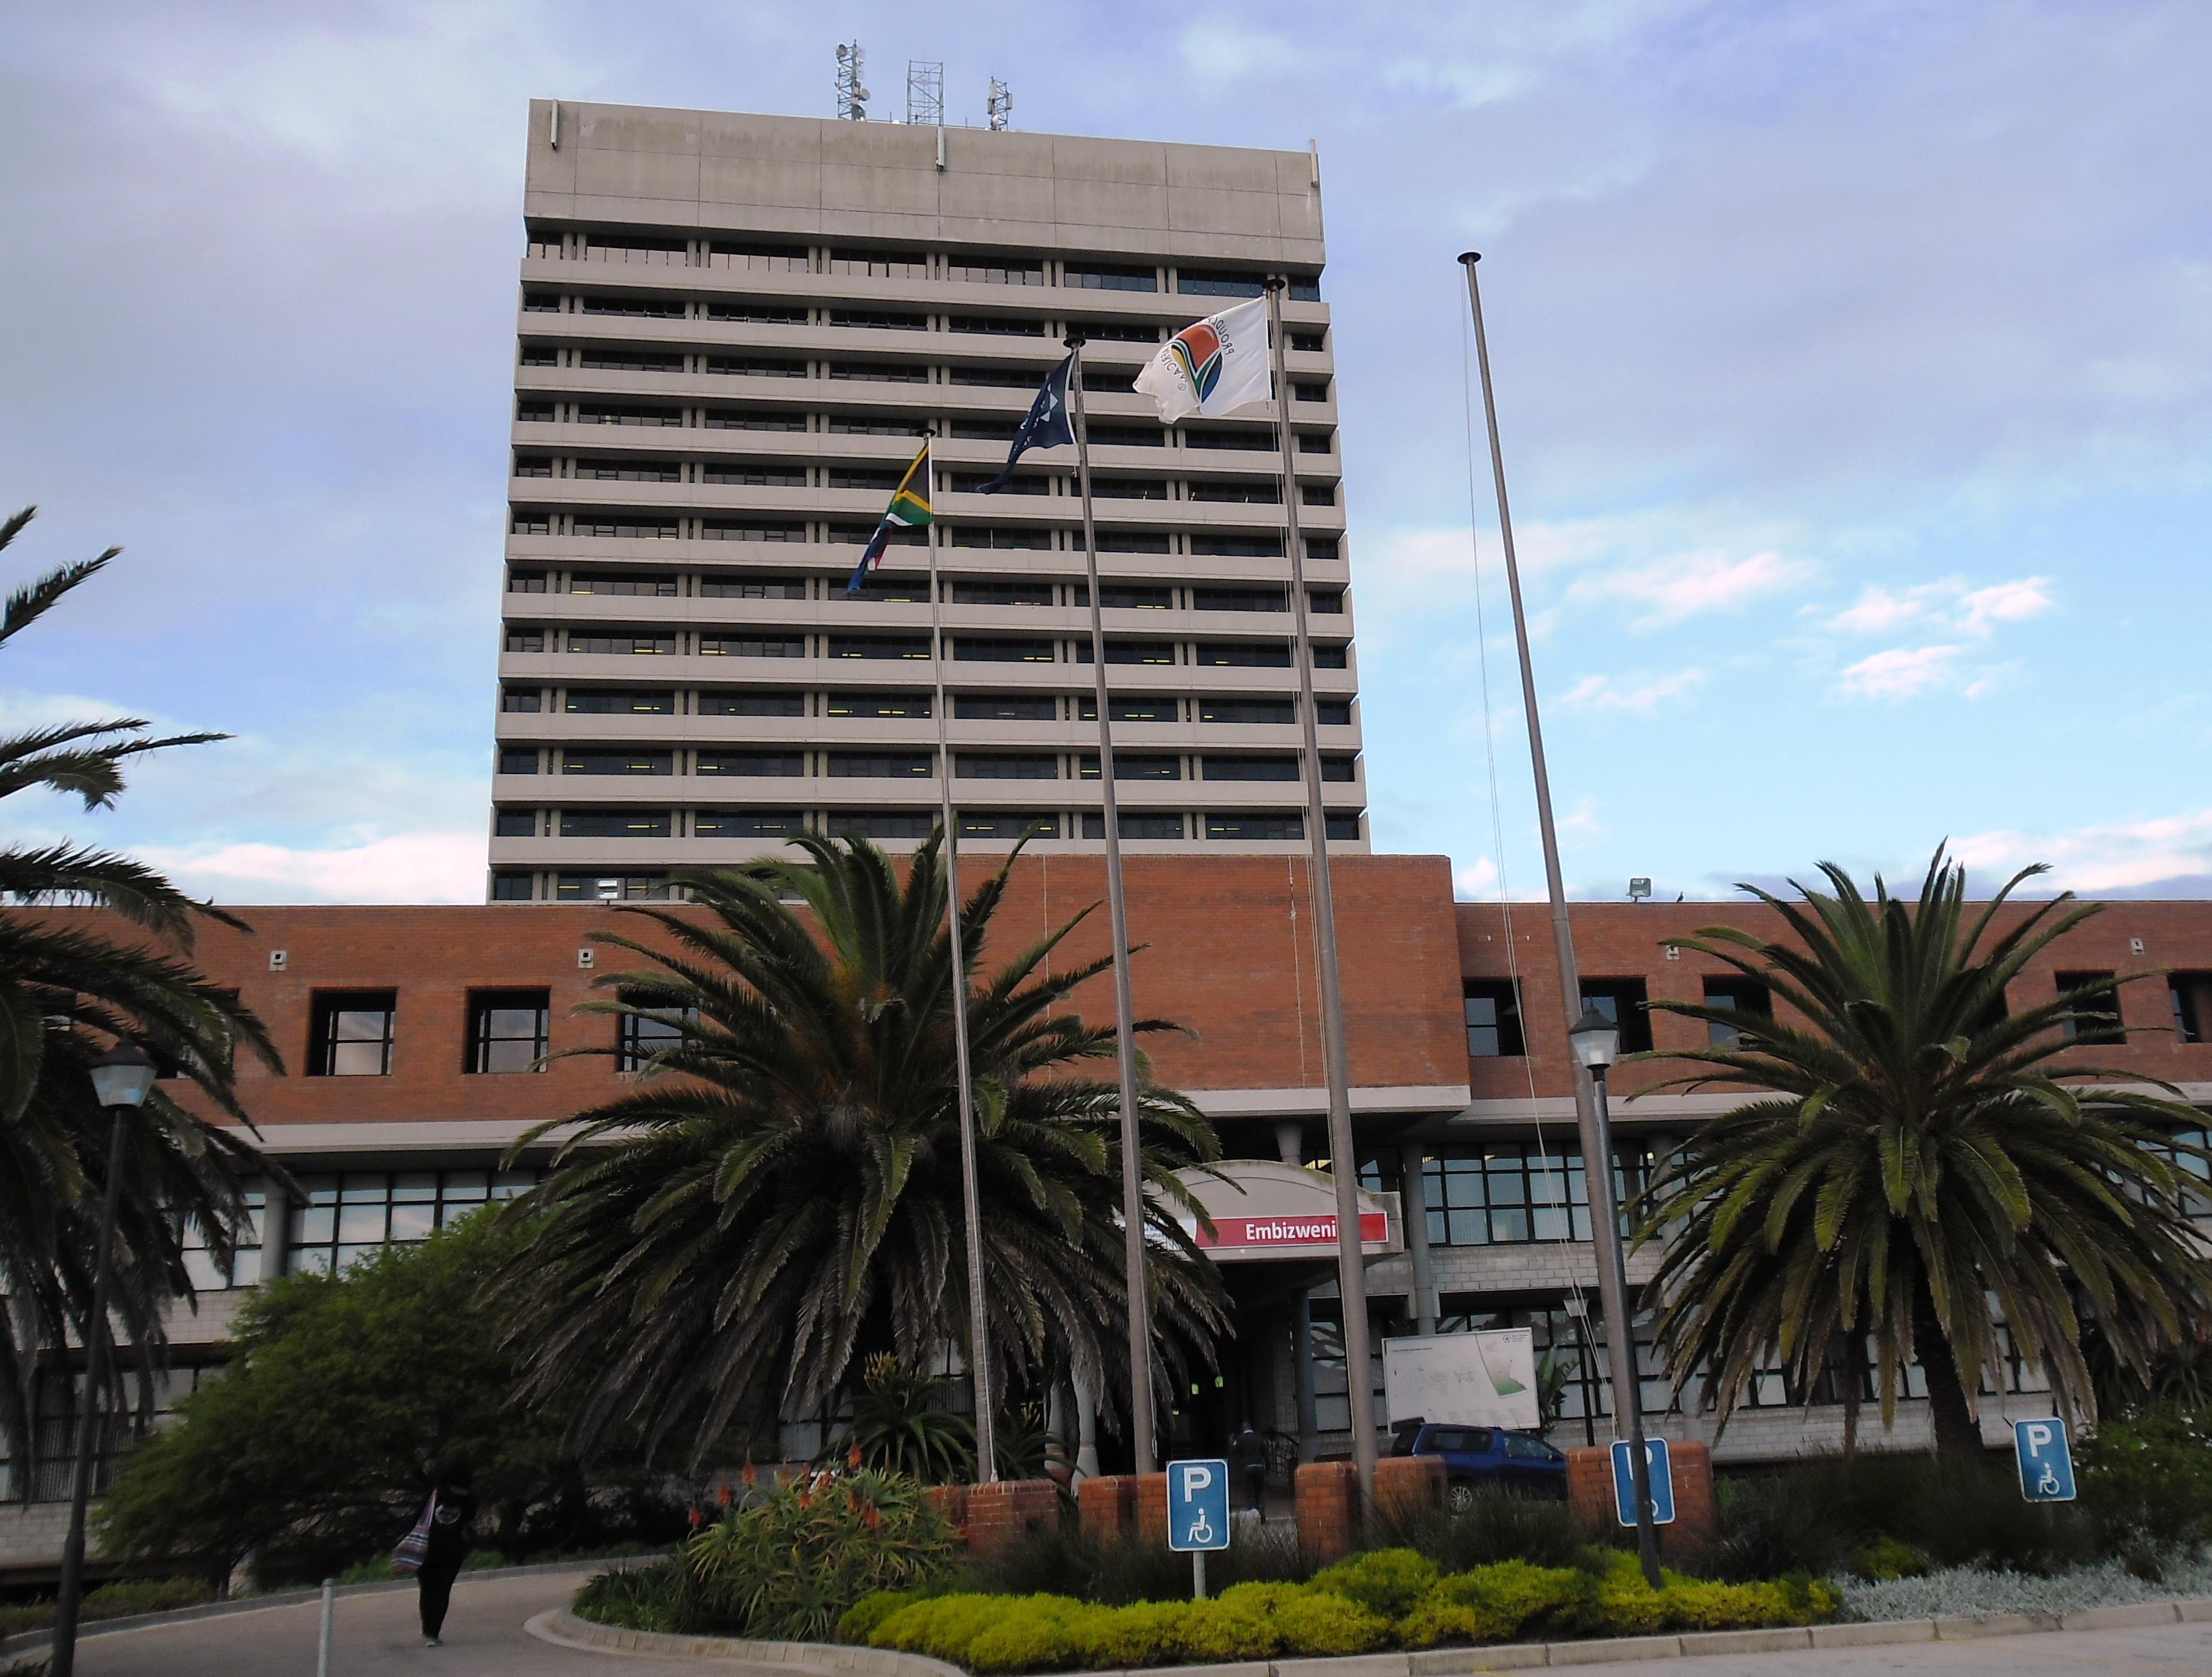 Nelson mandela bay poised to lead provincial maritime - Nelson mandela university port elizabeth ...